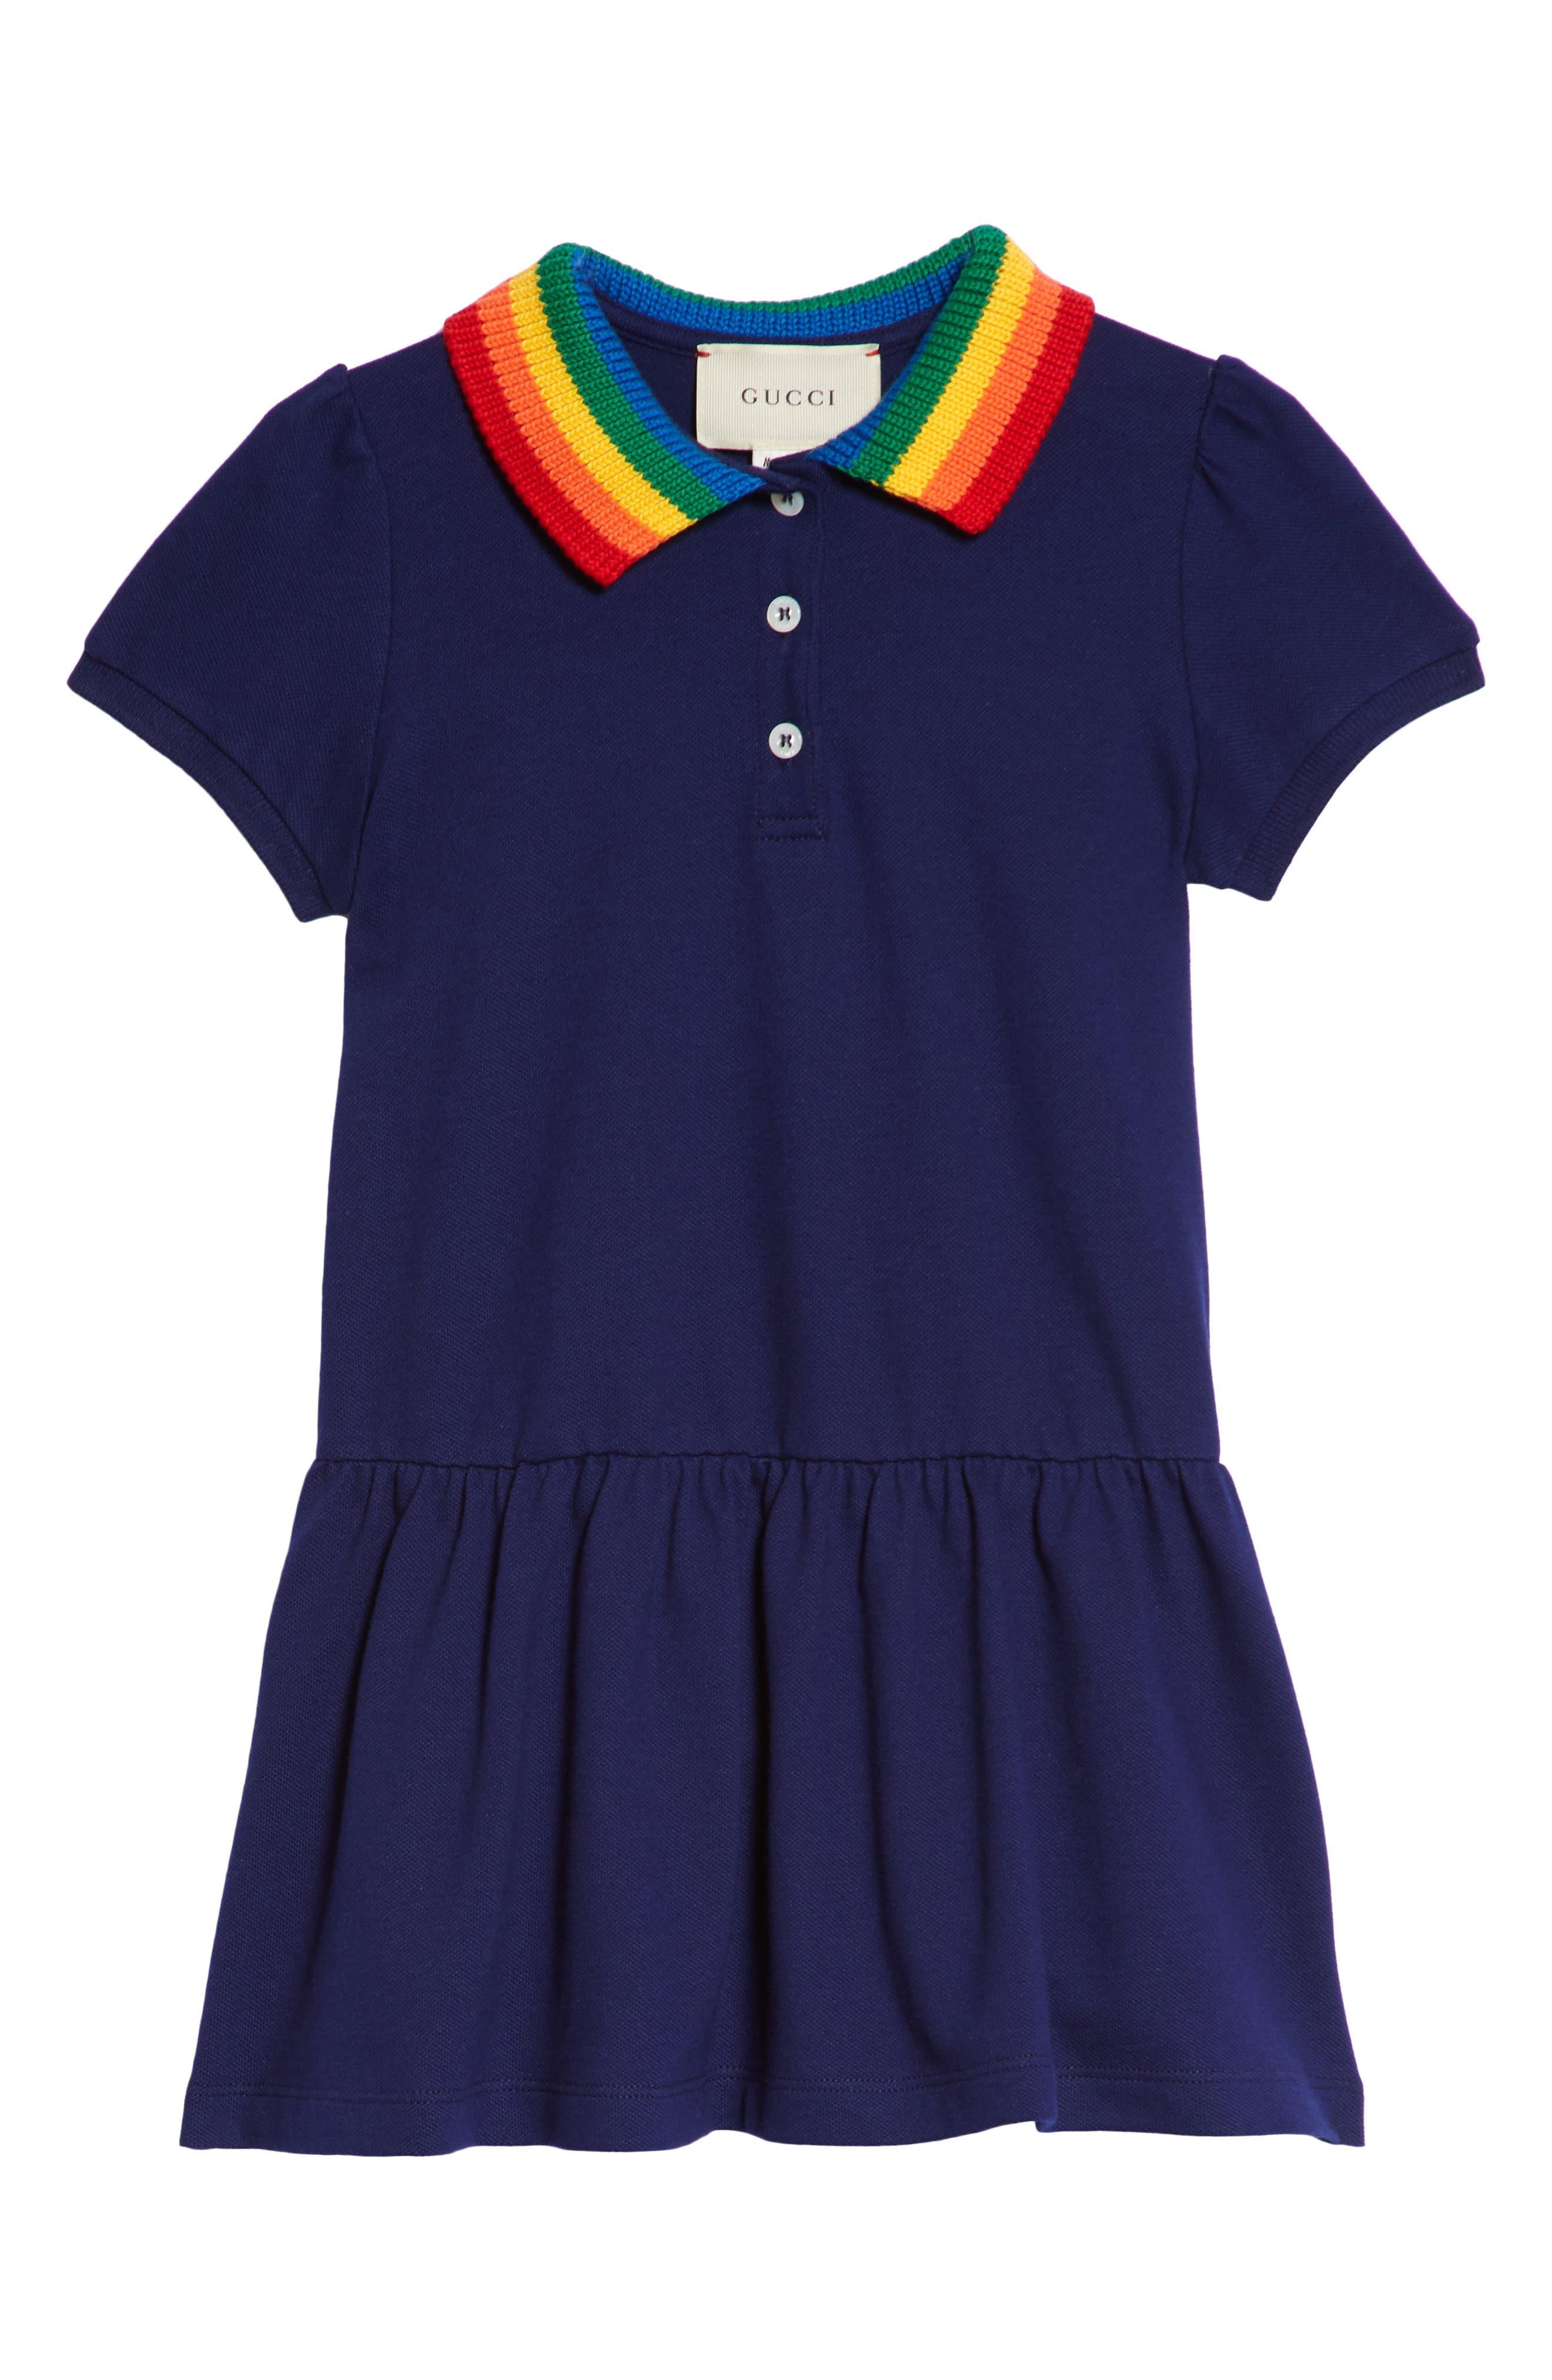 Gucci Polo Dress (Little Girls & Big Girls)